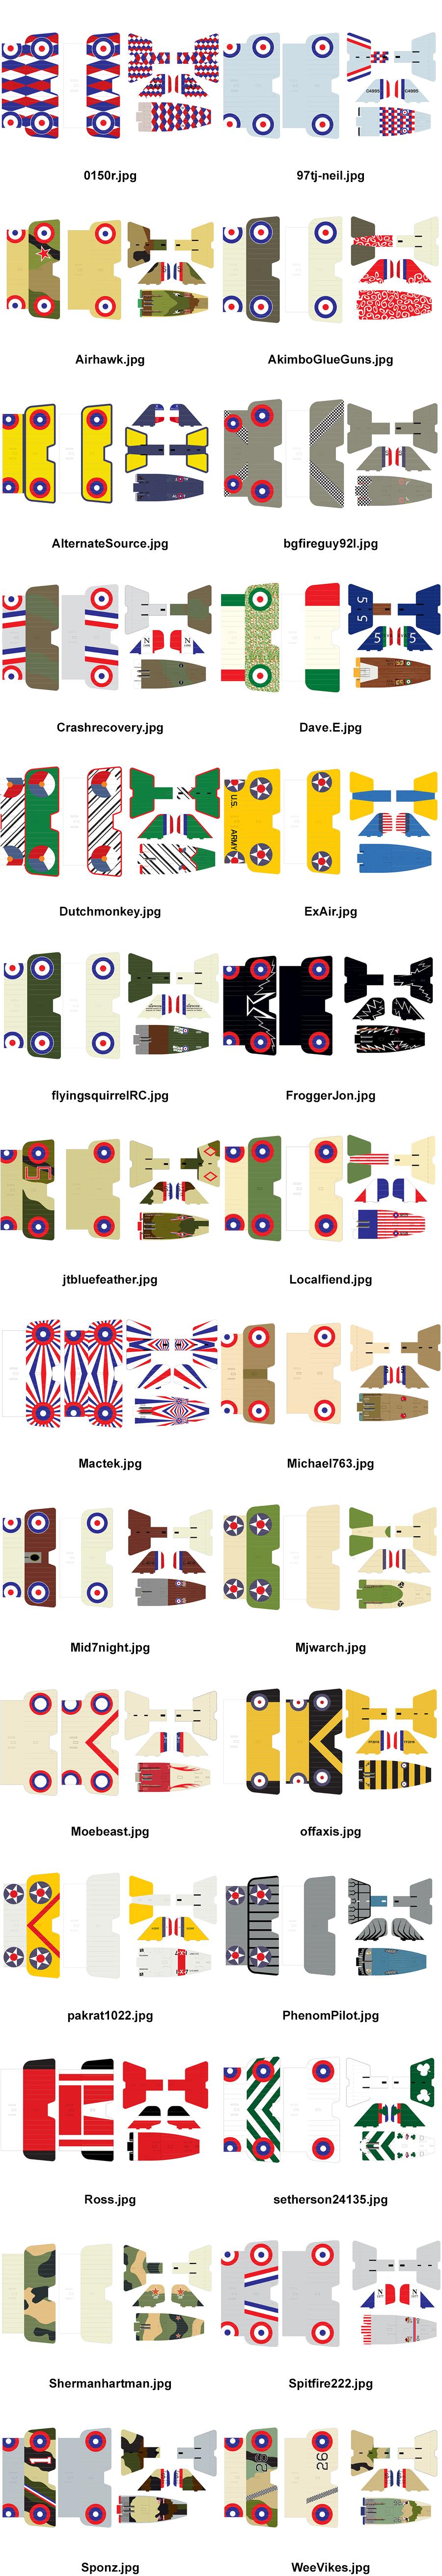 ContactSheet-Brit.jpg